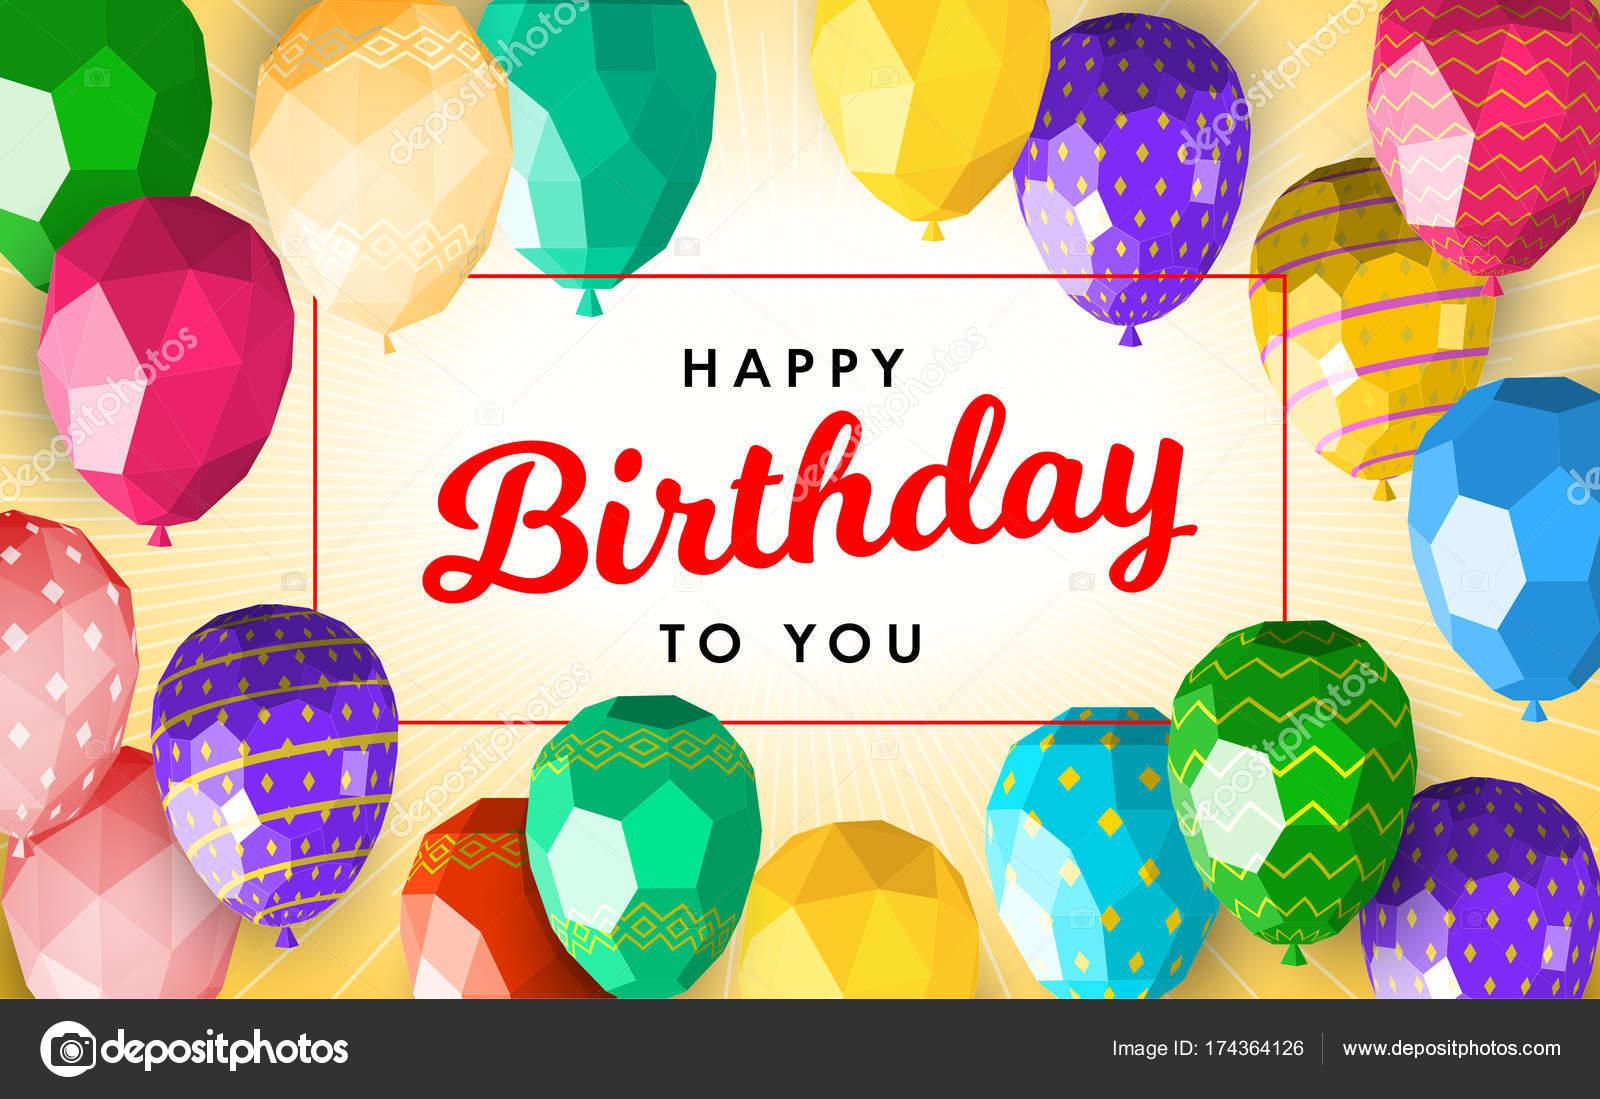 Happy Birthday Greeting Card Template With Modern Low Polygonal Balloons Good For Flyer Postcard Banner Leaflet Vektor Von Sundali